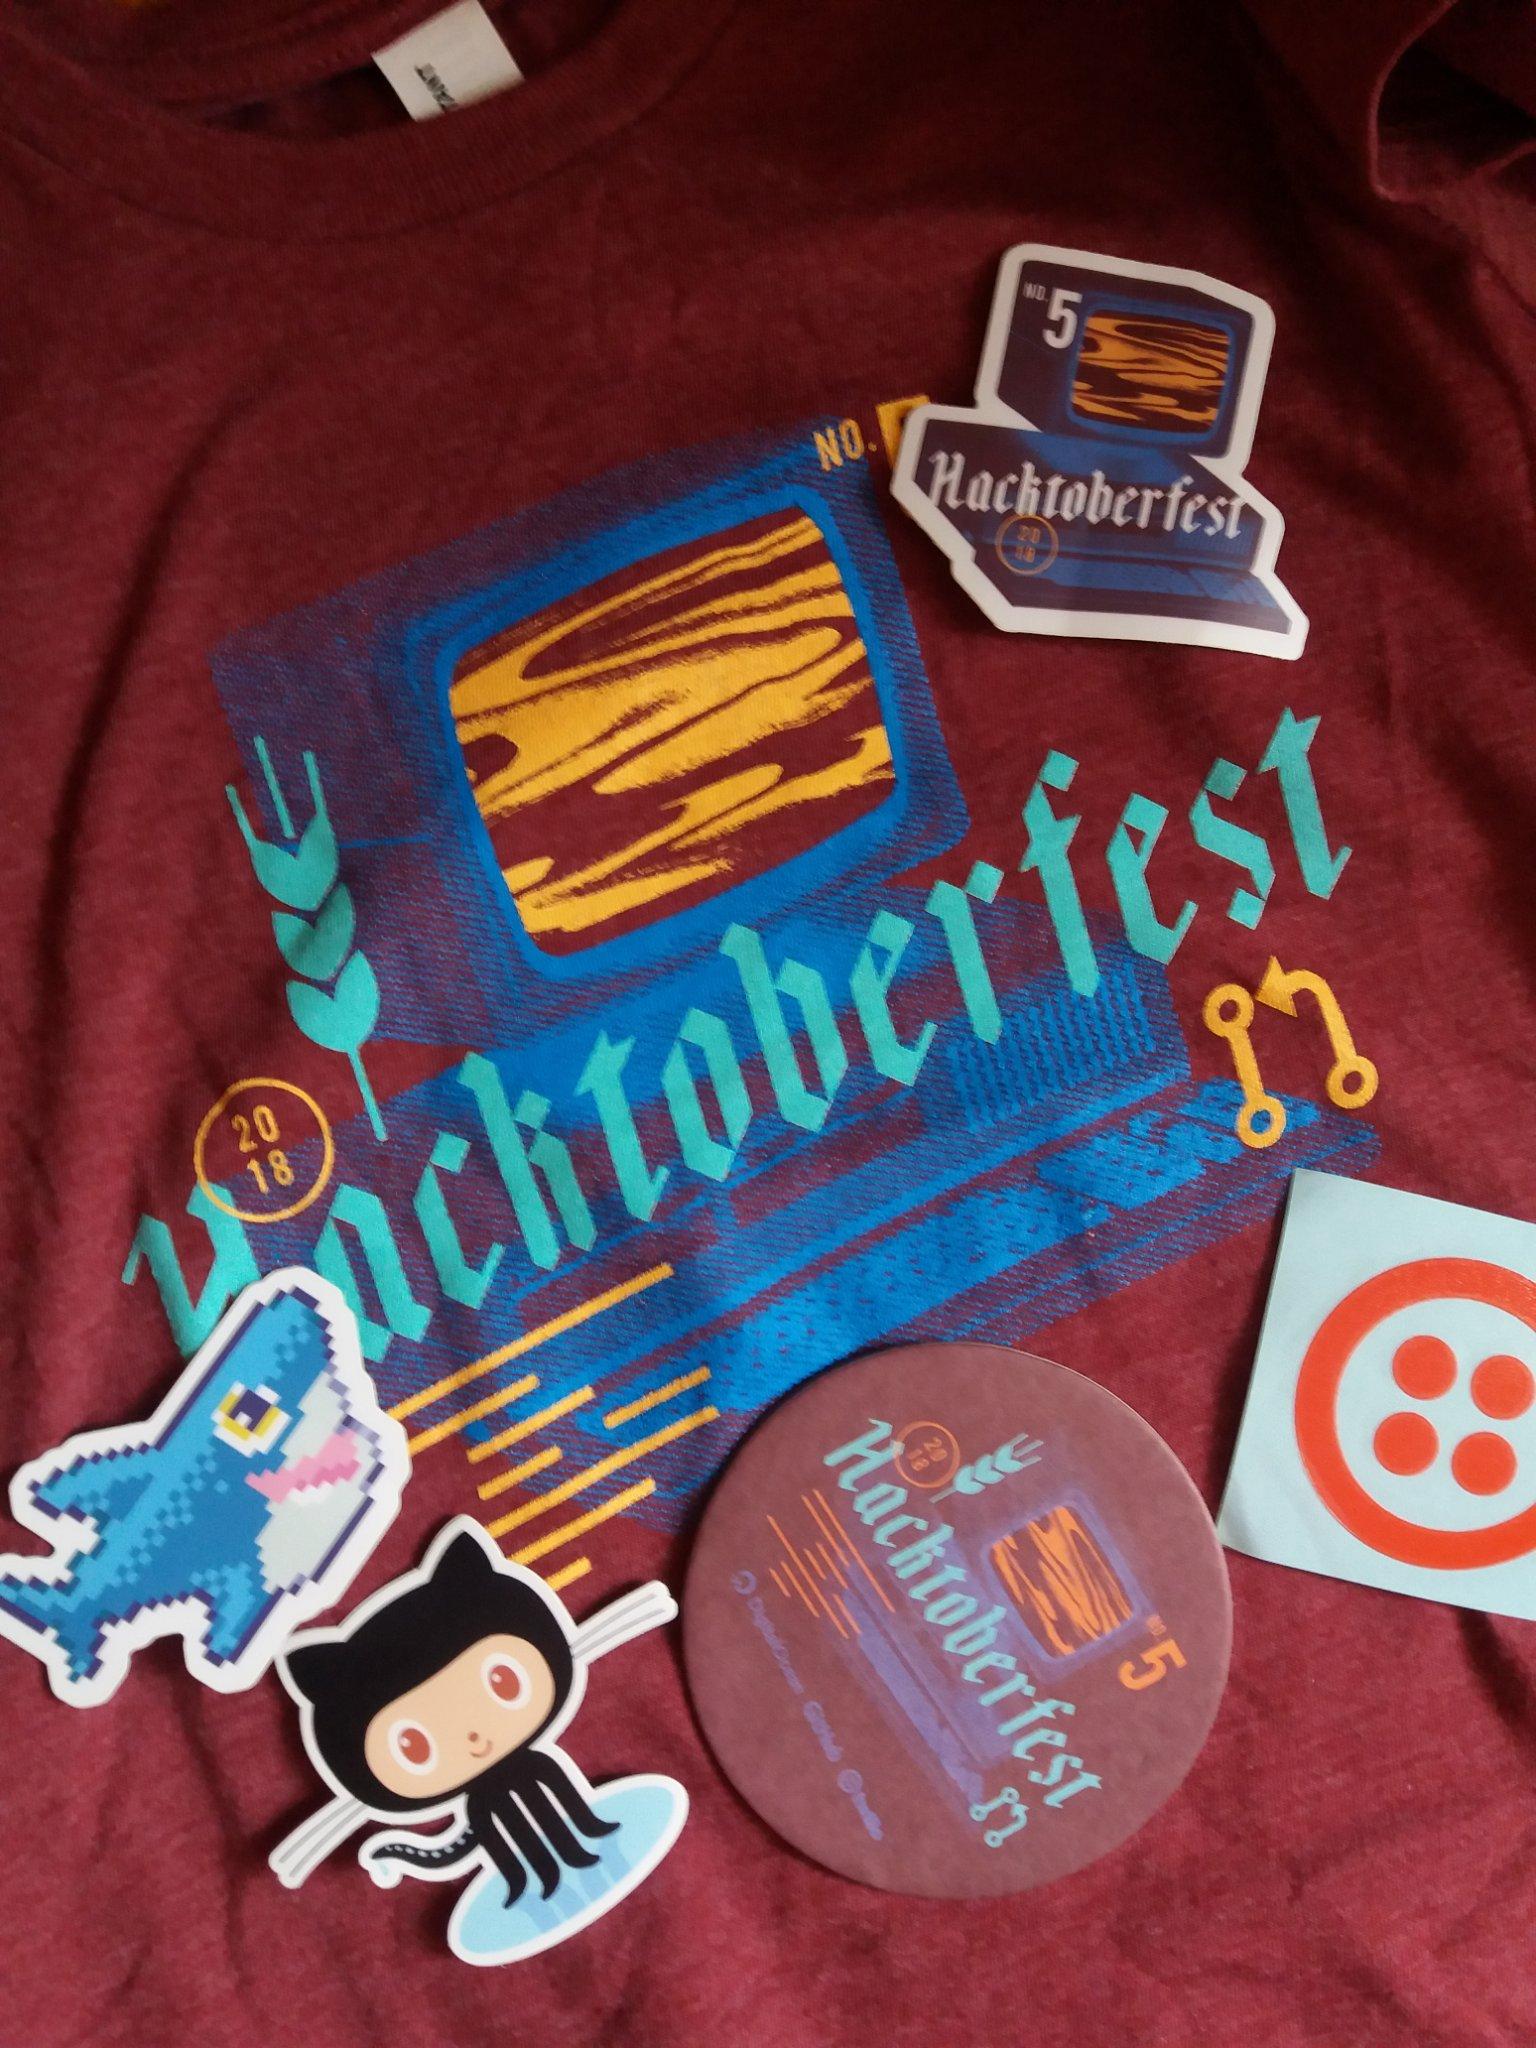 hacktoberfest-T-shirt-2018